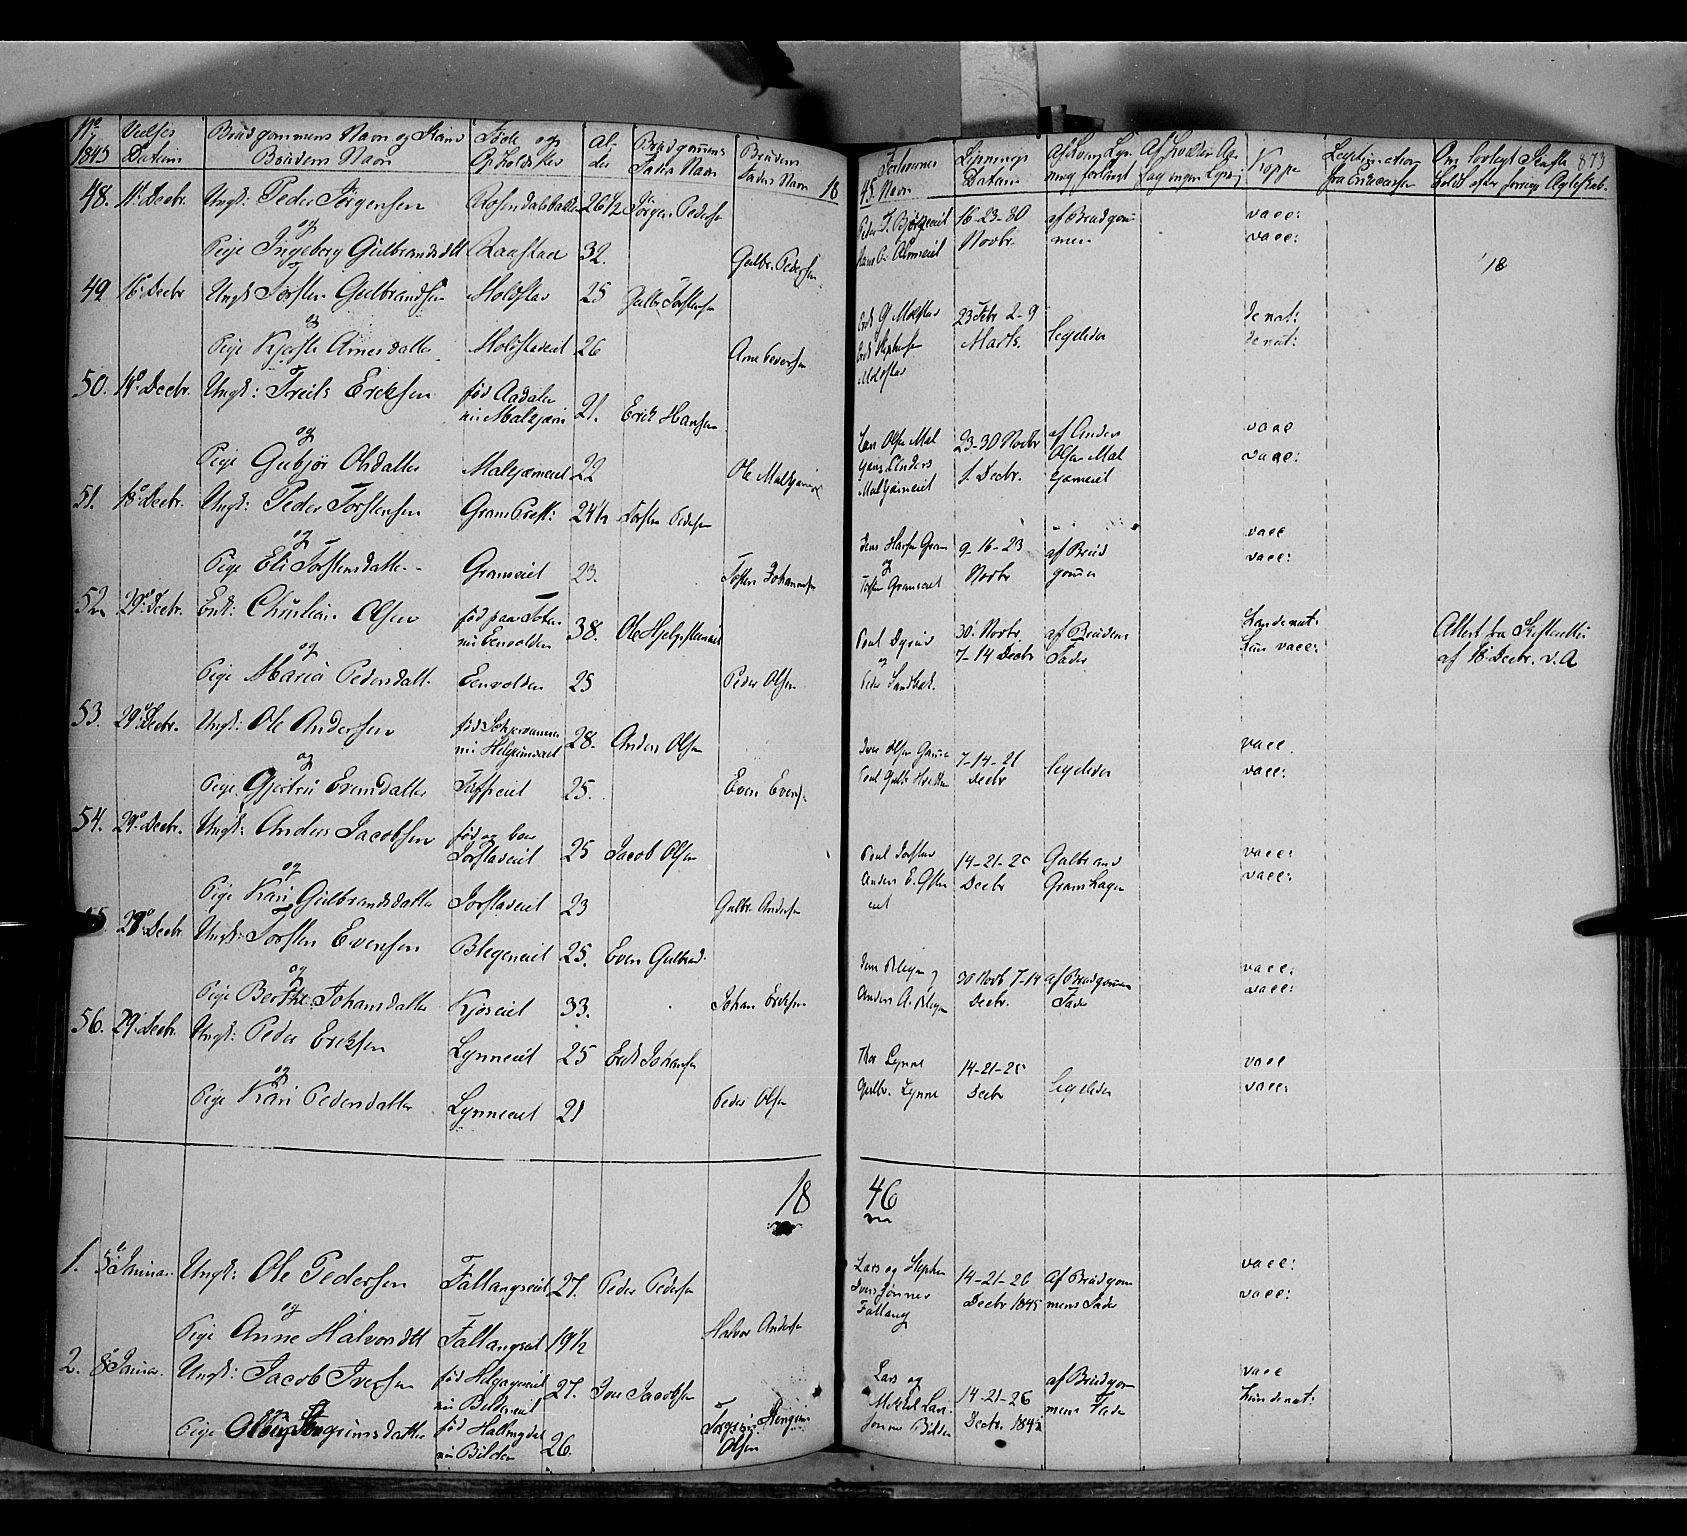 SAH, Gran prestekontor, Ministerialbok nr. 11, 1842-1856, s. 872-873